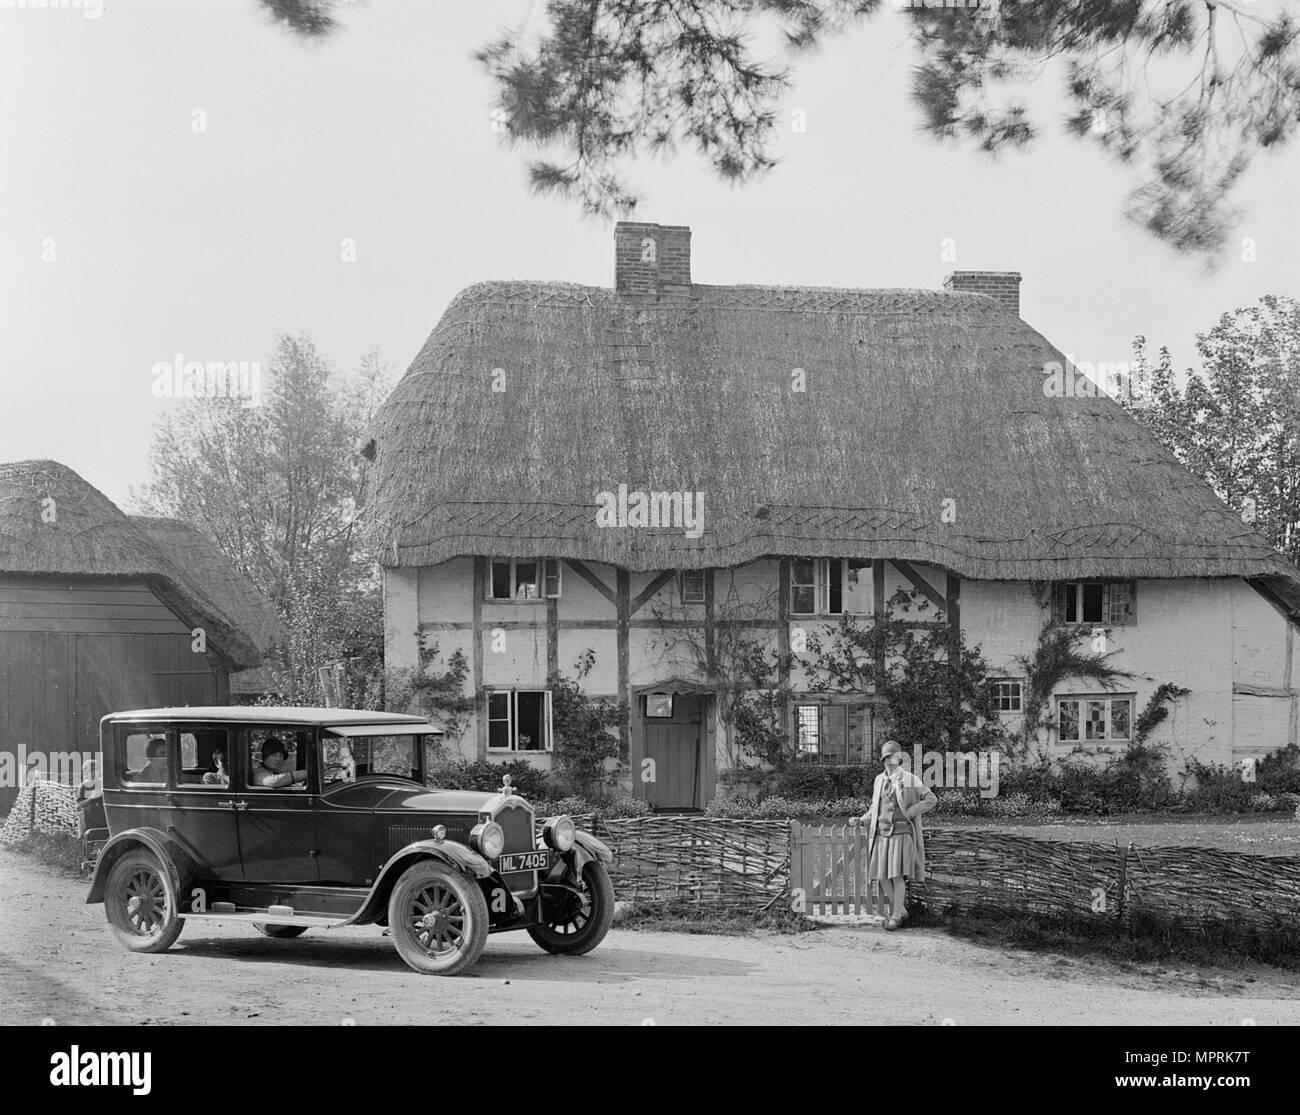 Buick 25/75 saloon, Garston, Wiltshire, c1930. Artist: Bill Brunell. - Stock Image